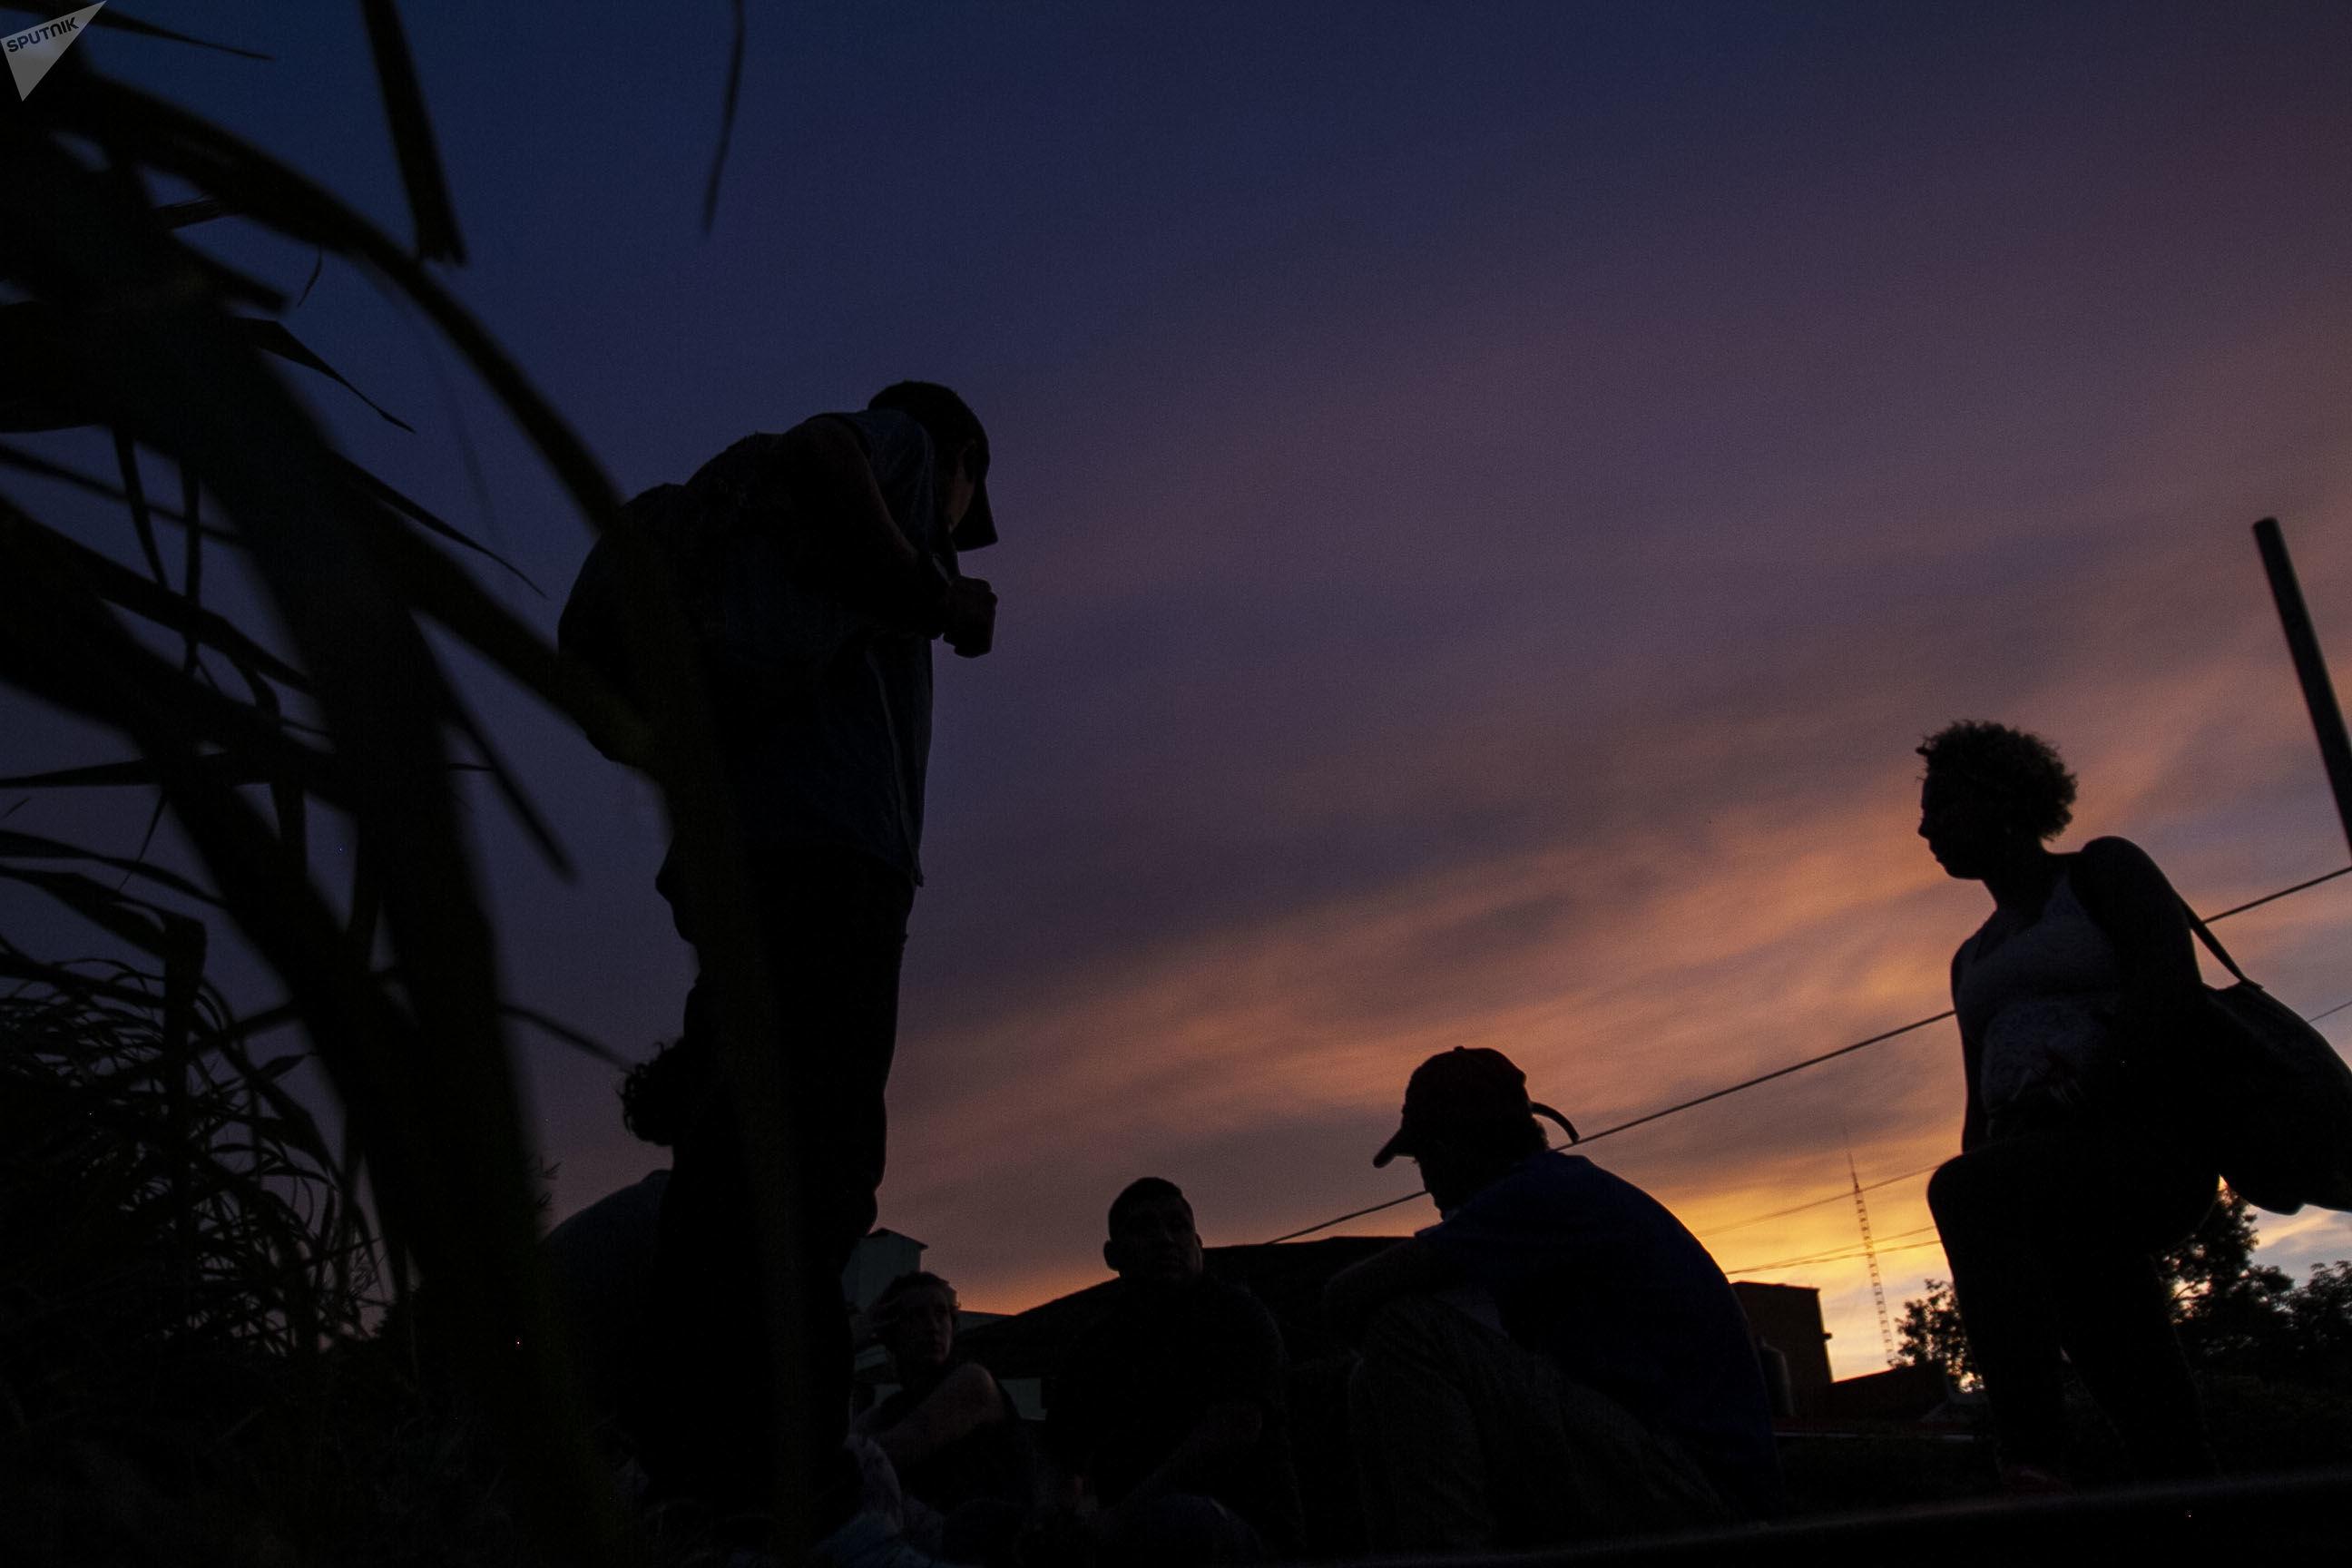 Migrantes esperan la llegada del tren apodado 'La Bestia' para viajar a los EEUU